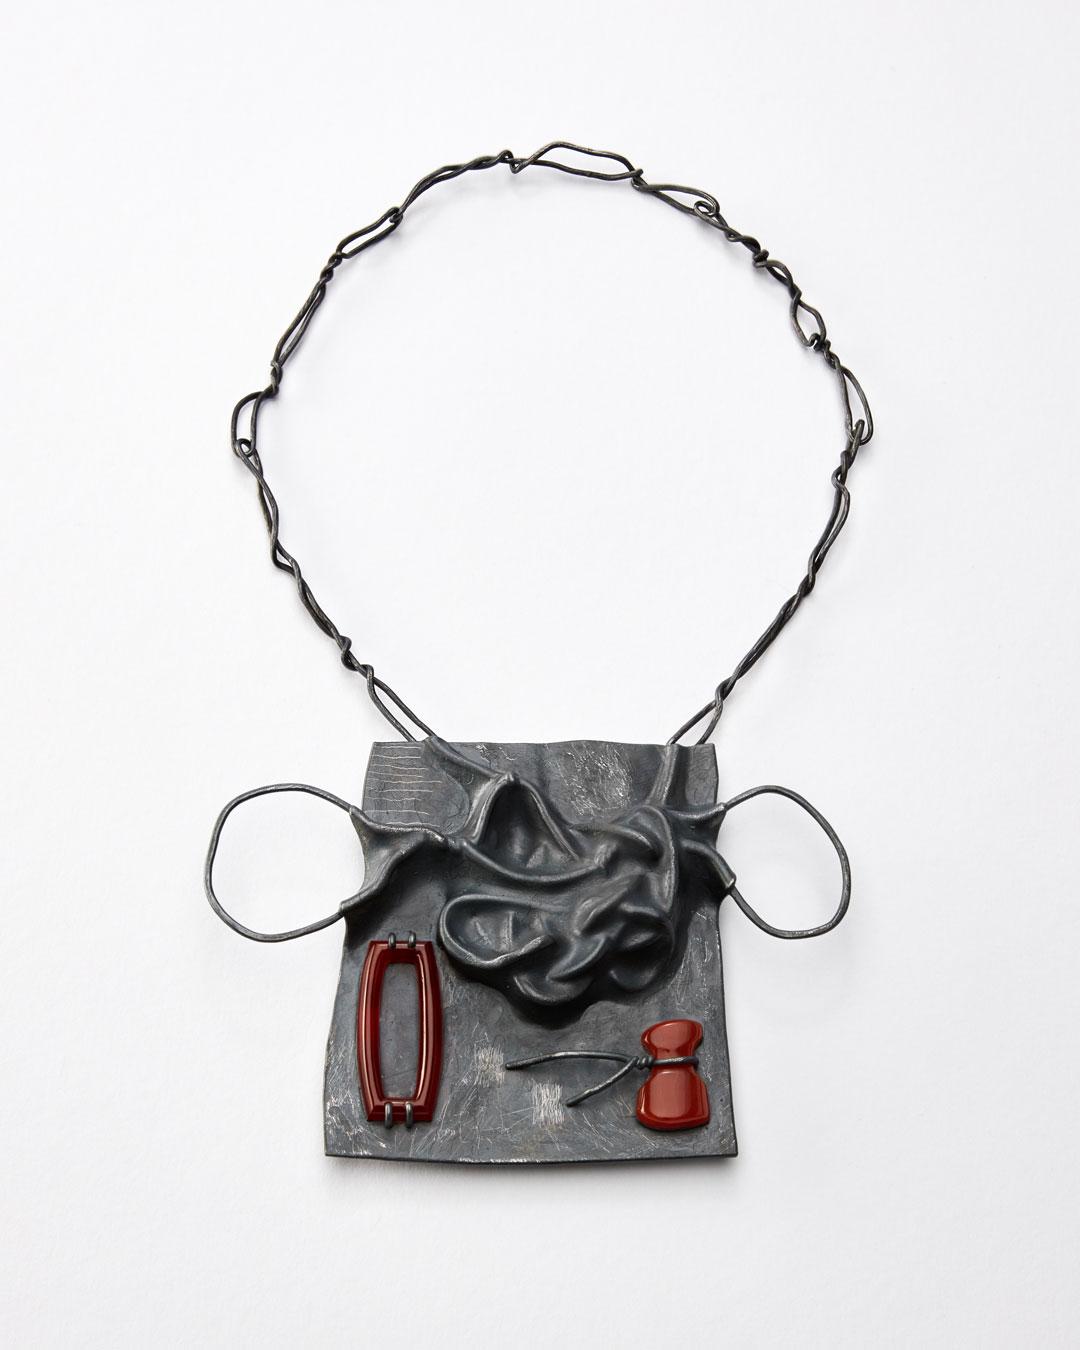 Iris Bodemer, Klang 5 (Sound 5), 2019, pendant; silver, thermoplastic, carnelian, 100 x 140 x 15 mm, €4000